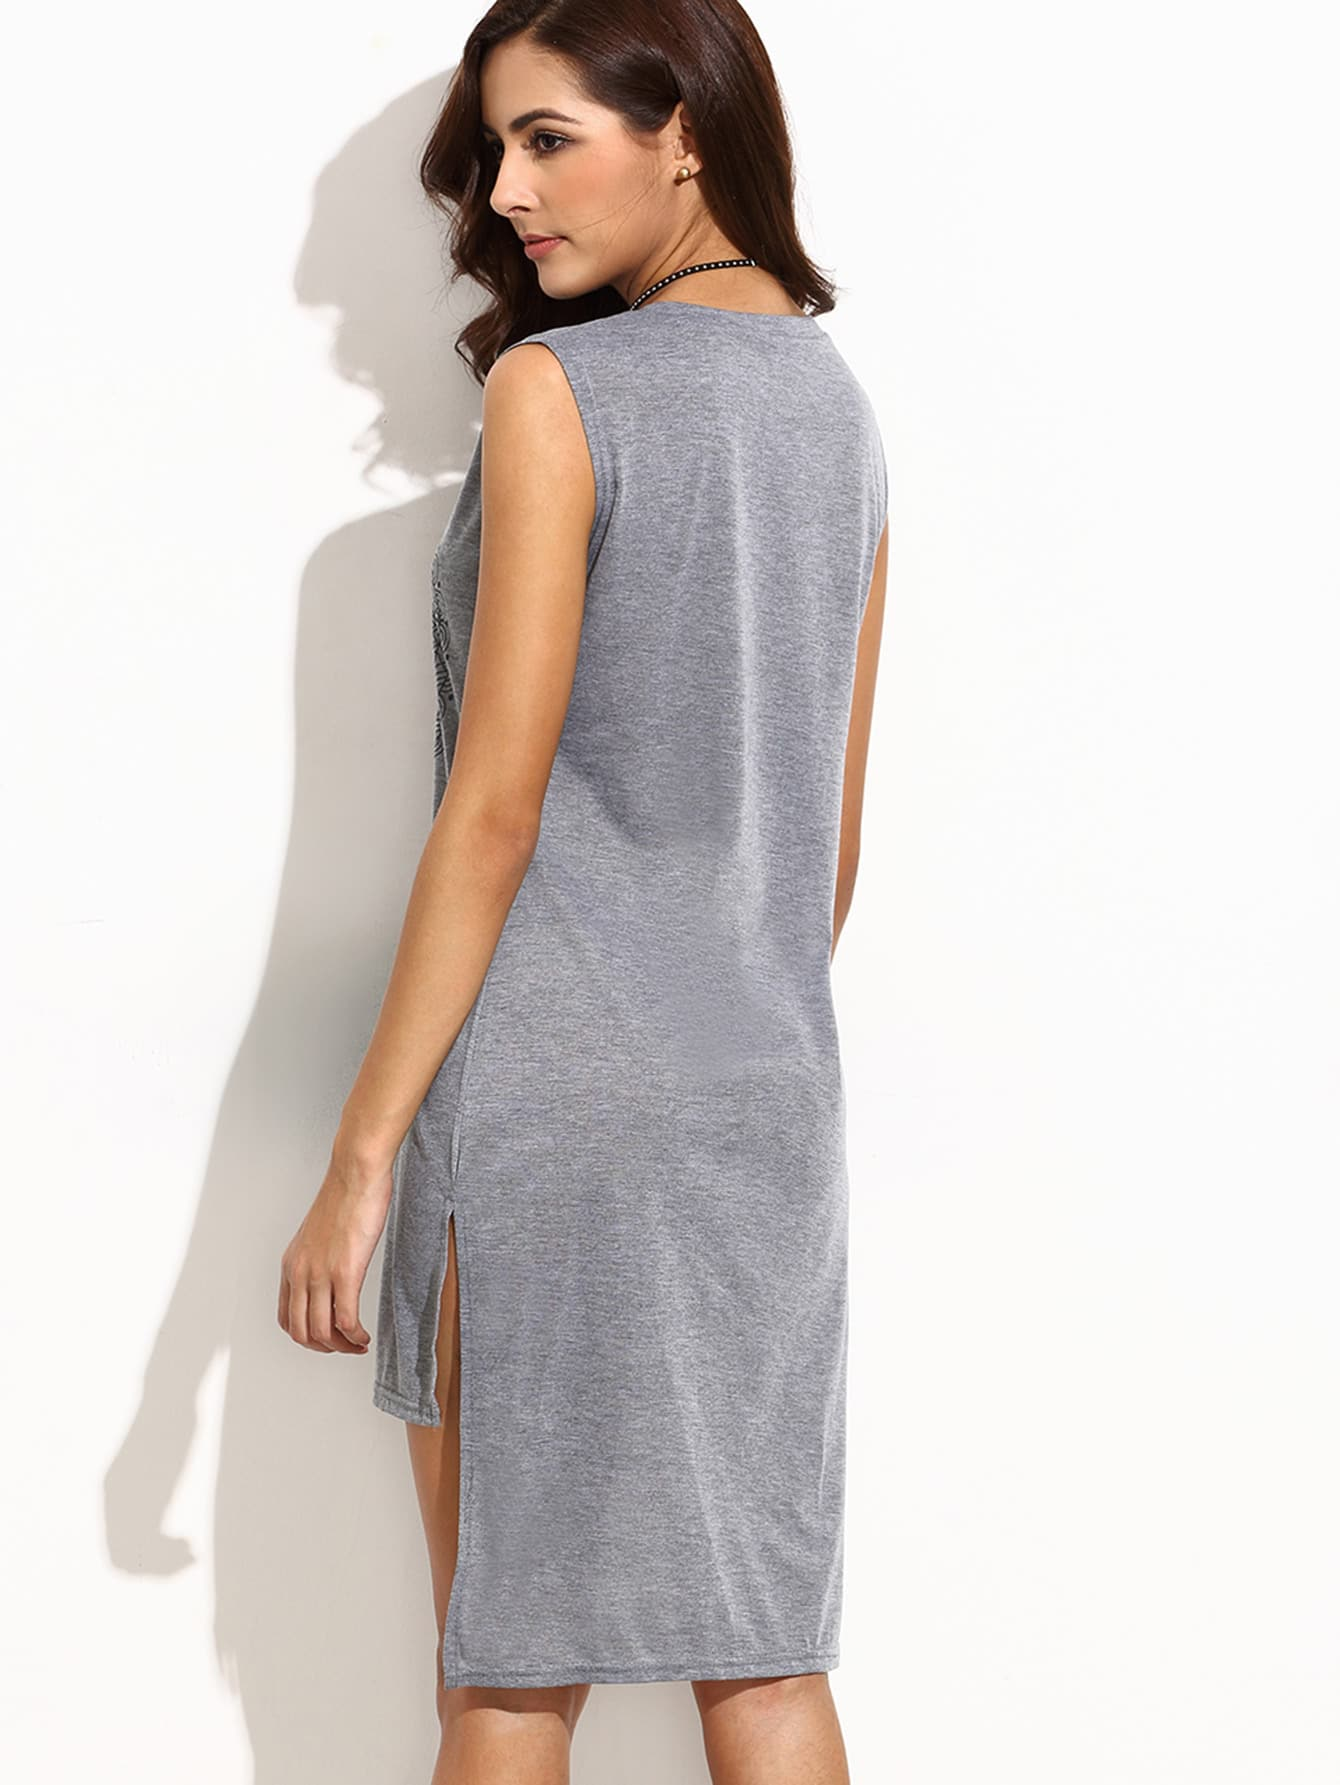 Heather Grey Circle Print High Low Slit Dress